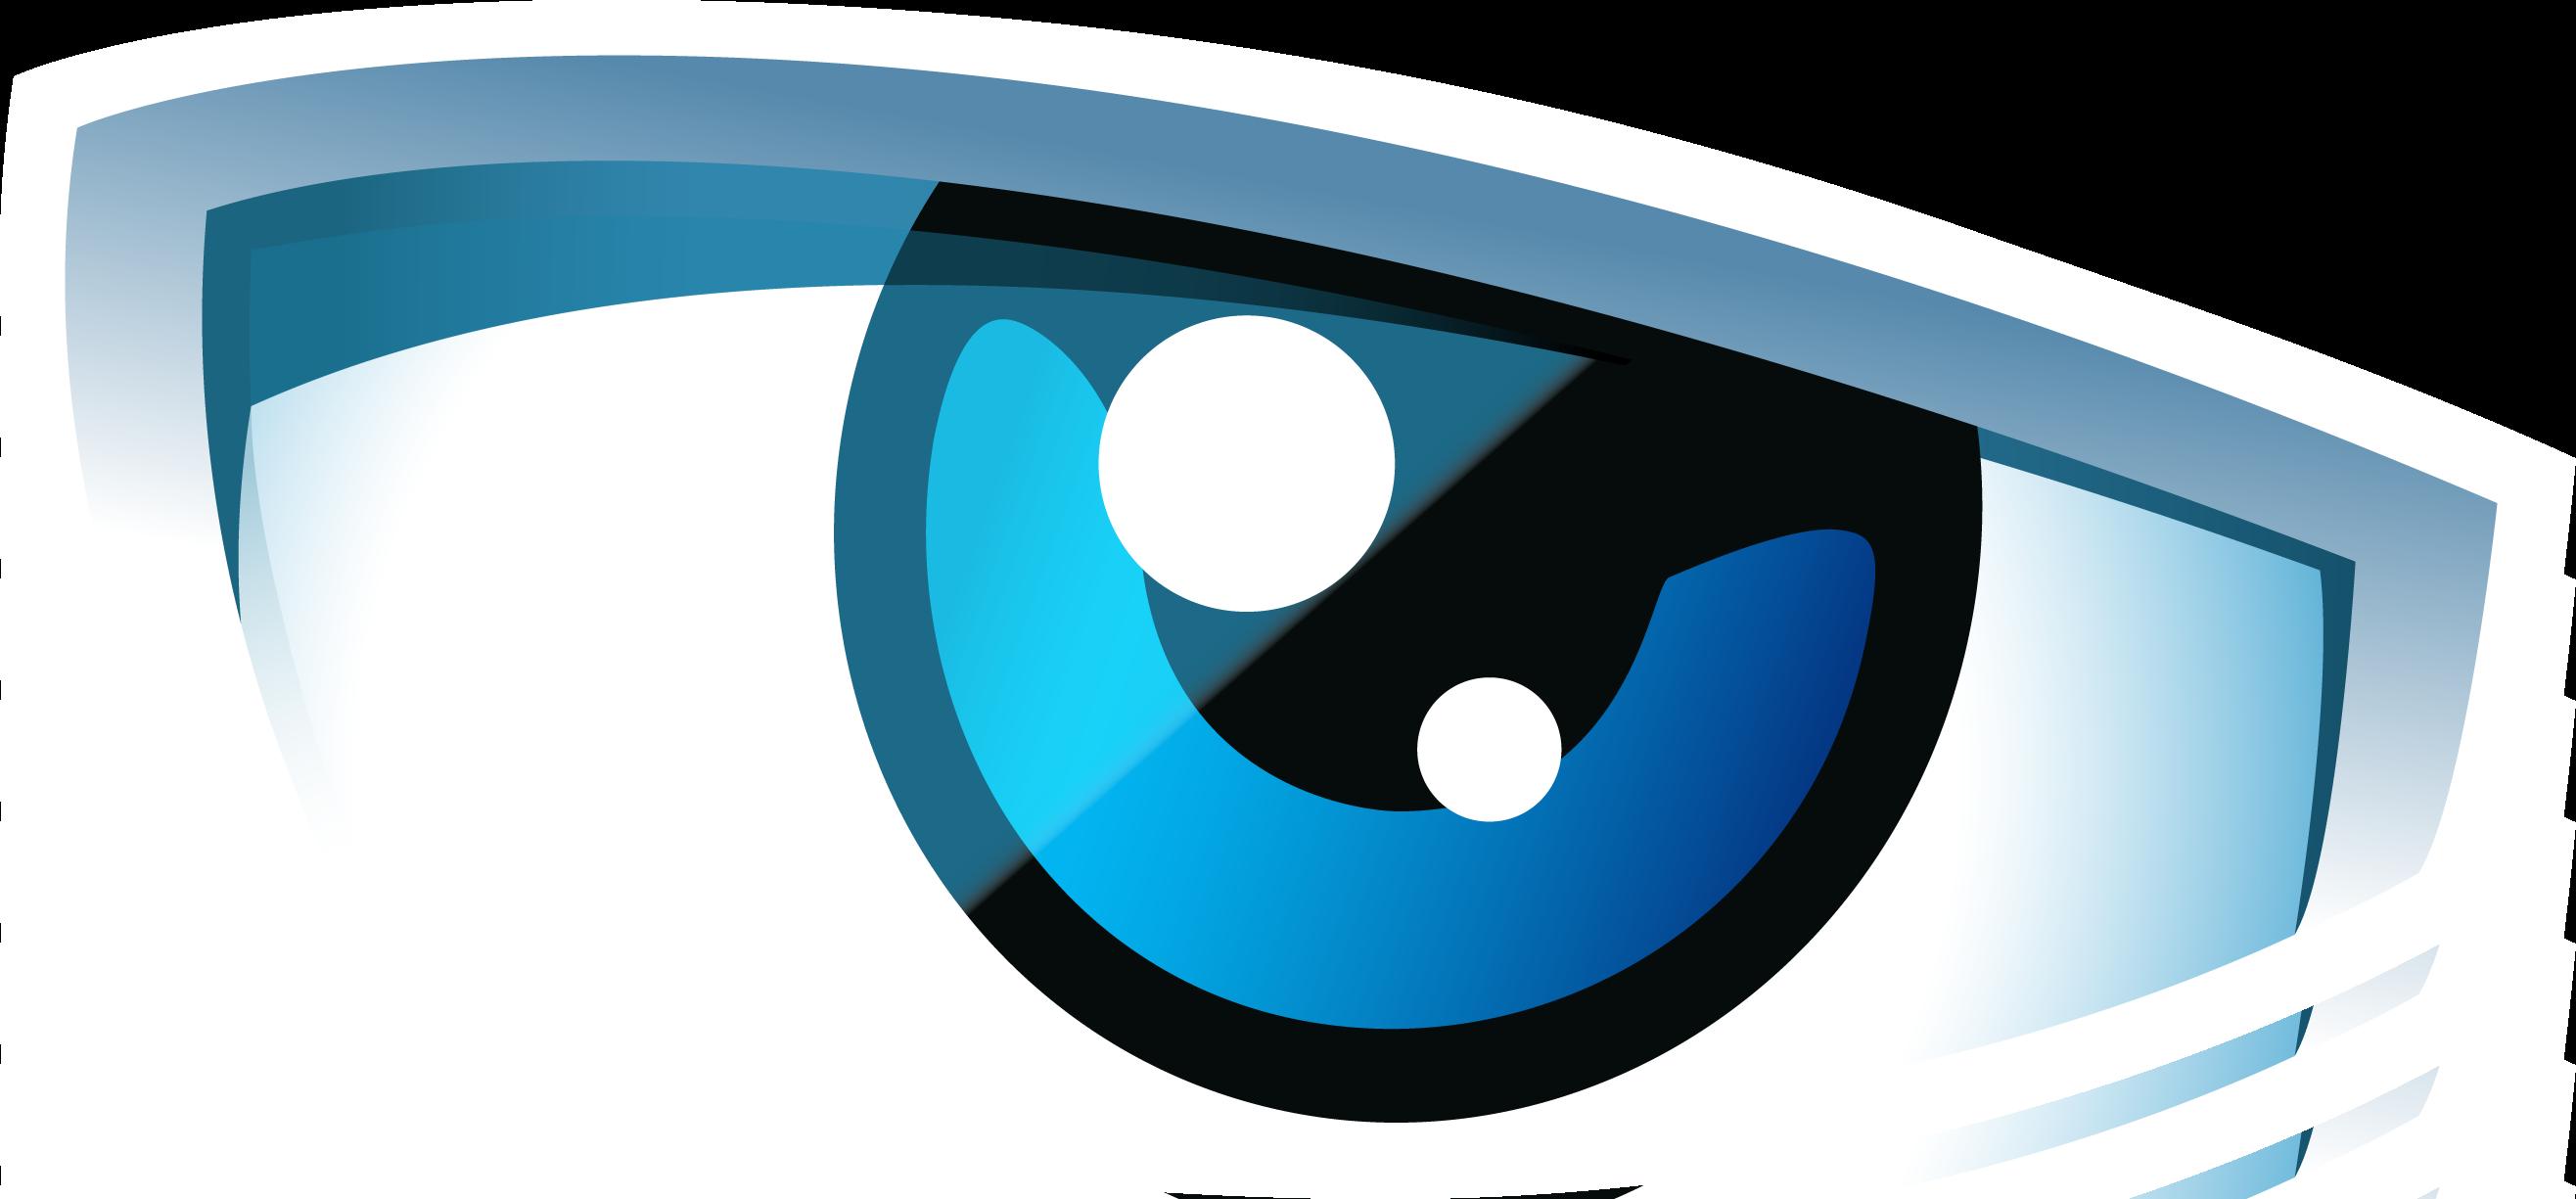 http://cyril.bourreau.free.fr/Vectoriel/Logo-Secretstory-oeil.png